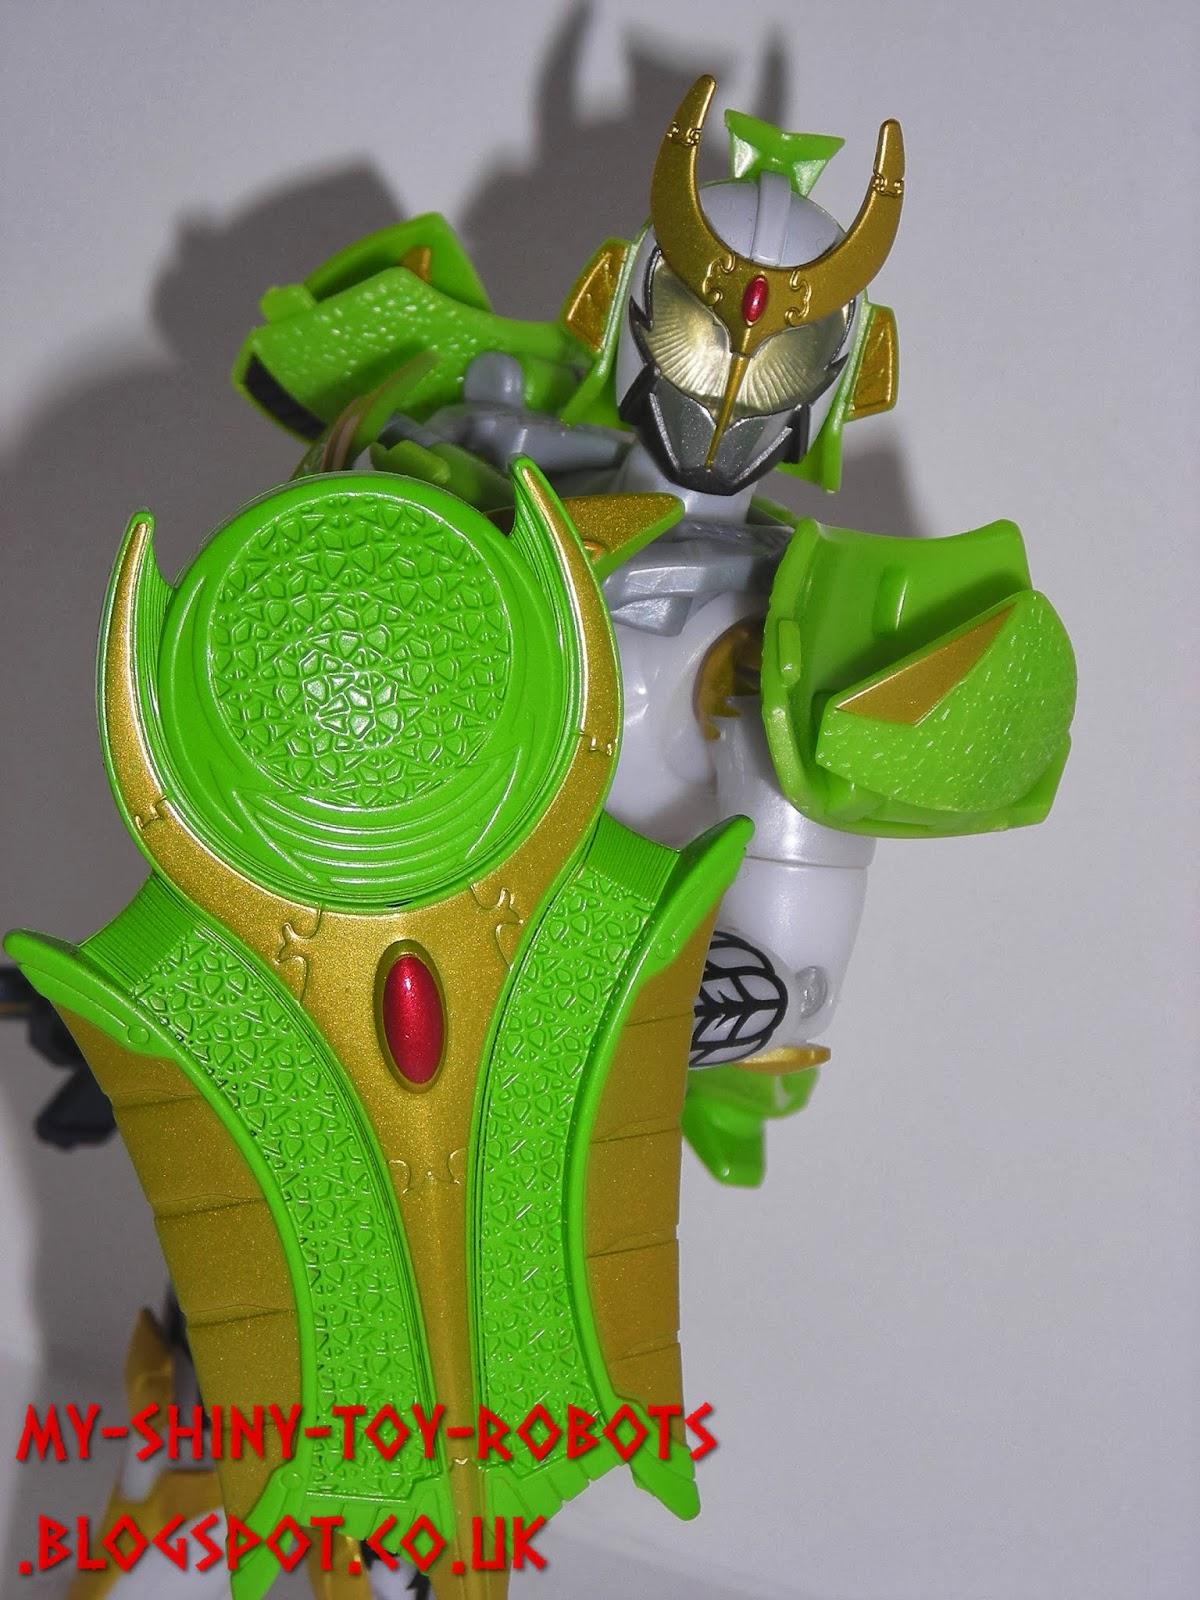 SOIYA! MELON ARMS! TENKA GOMEN!